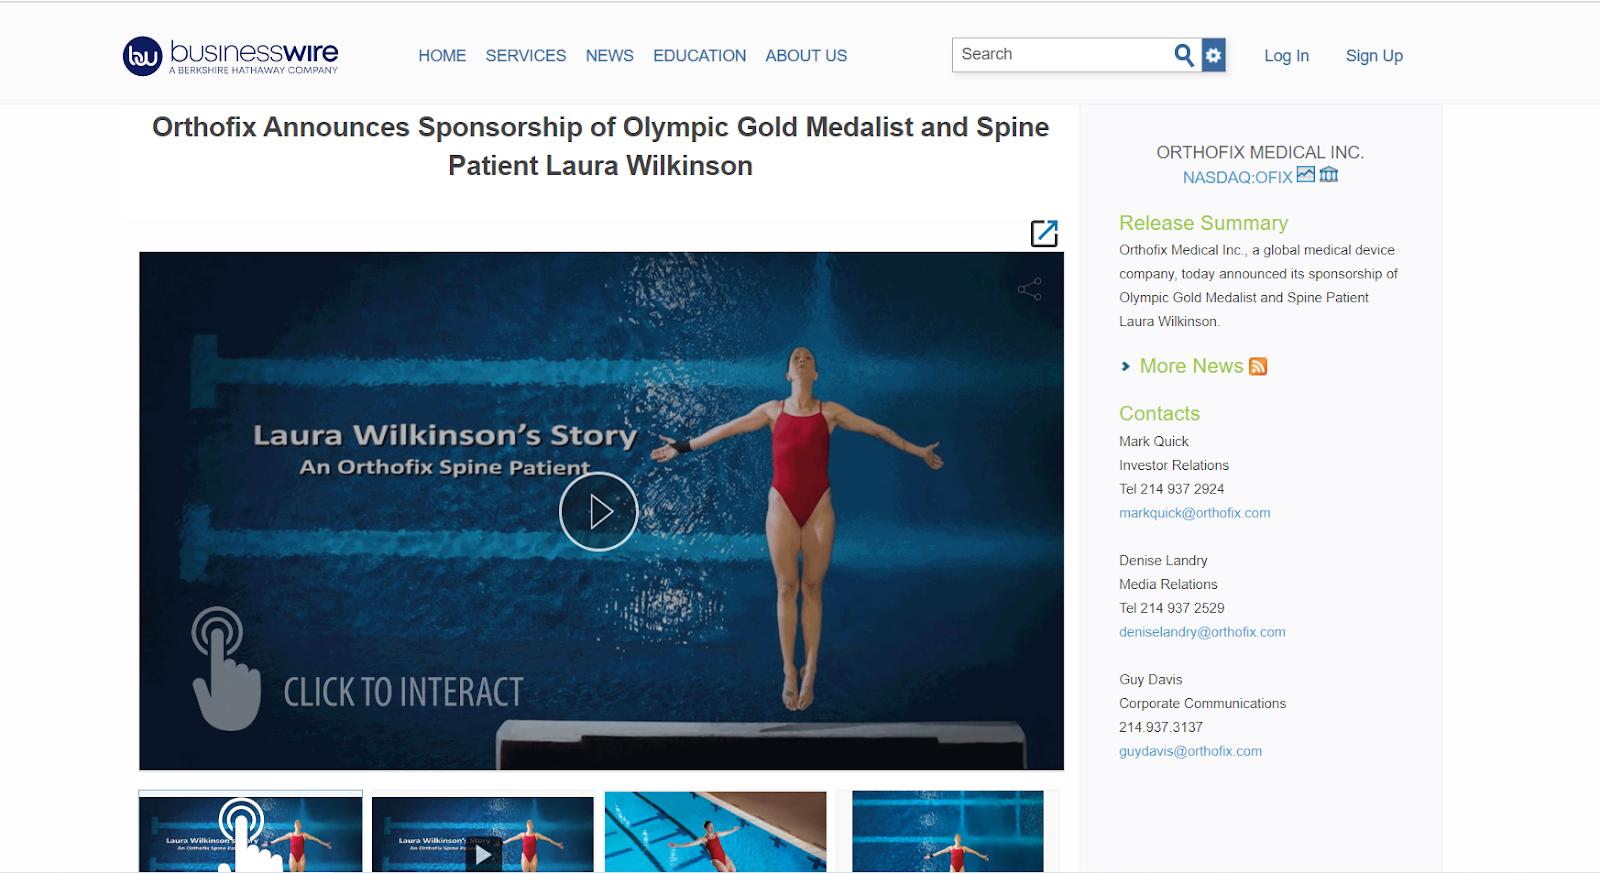 Orthofix Interactive Press Release Example